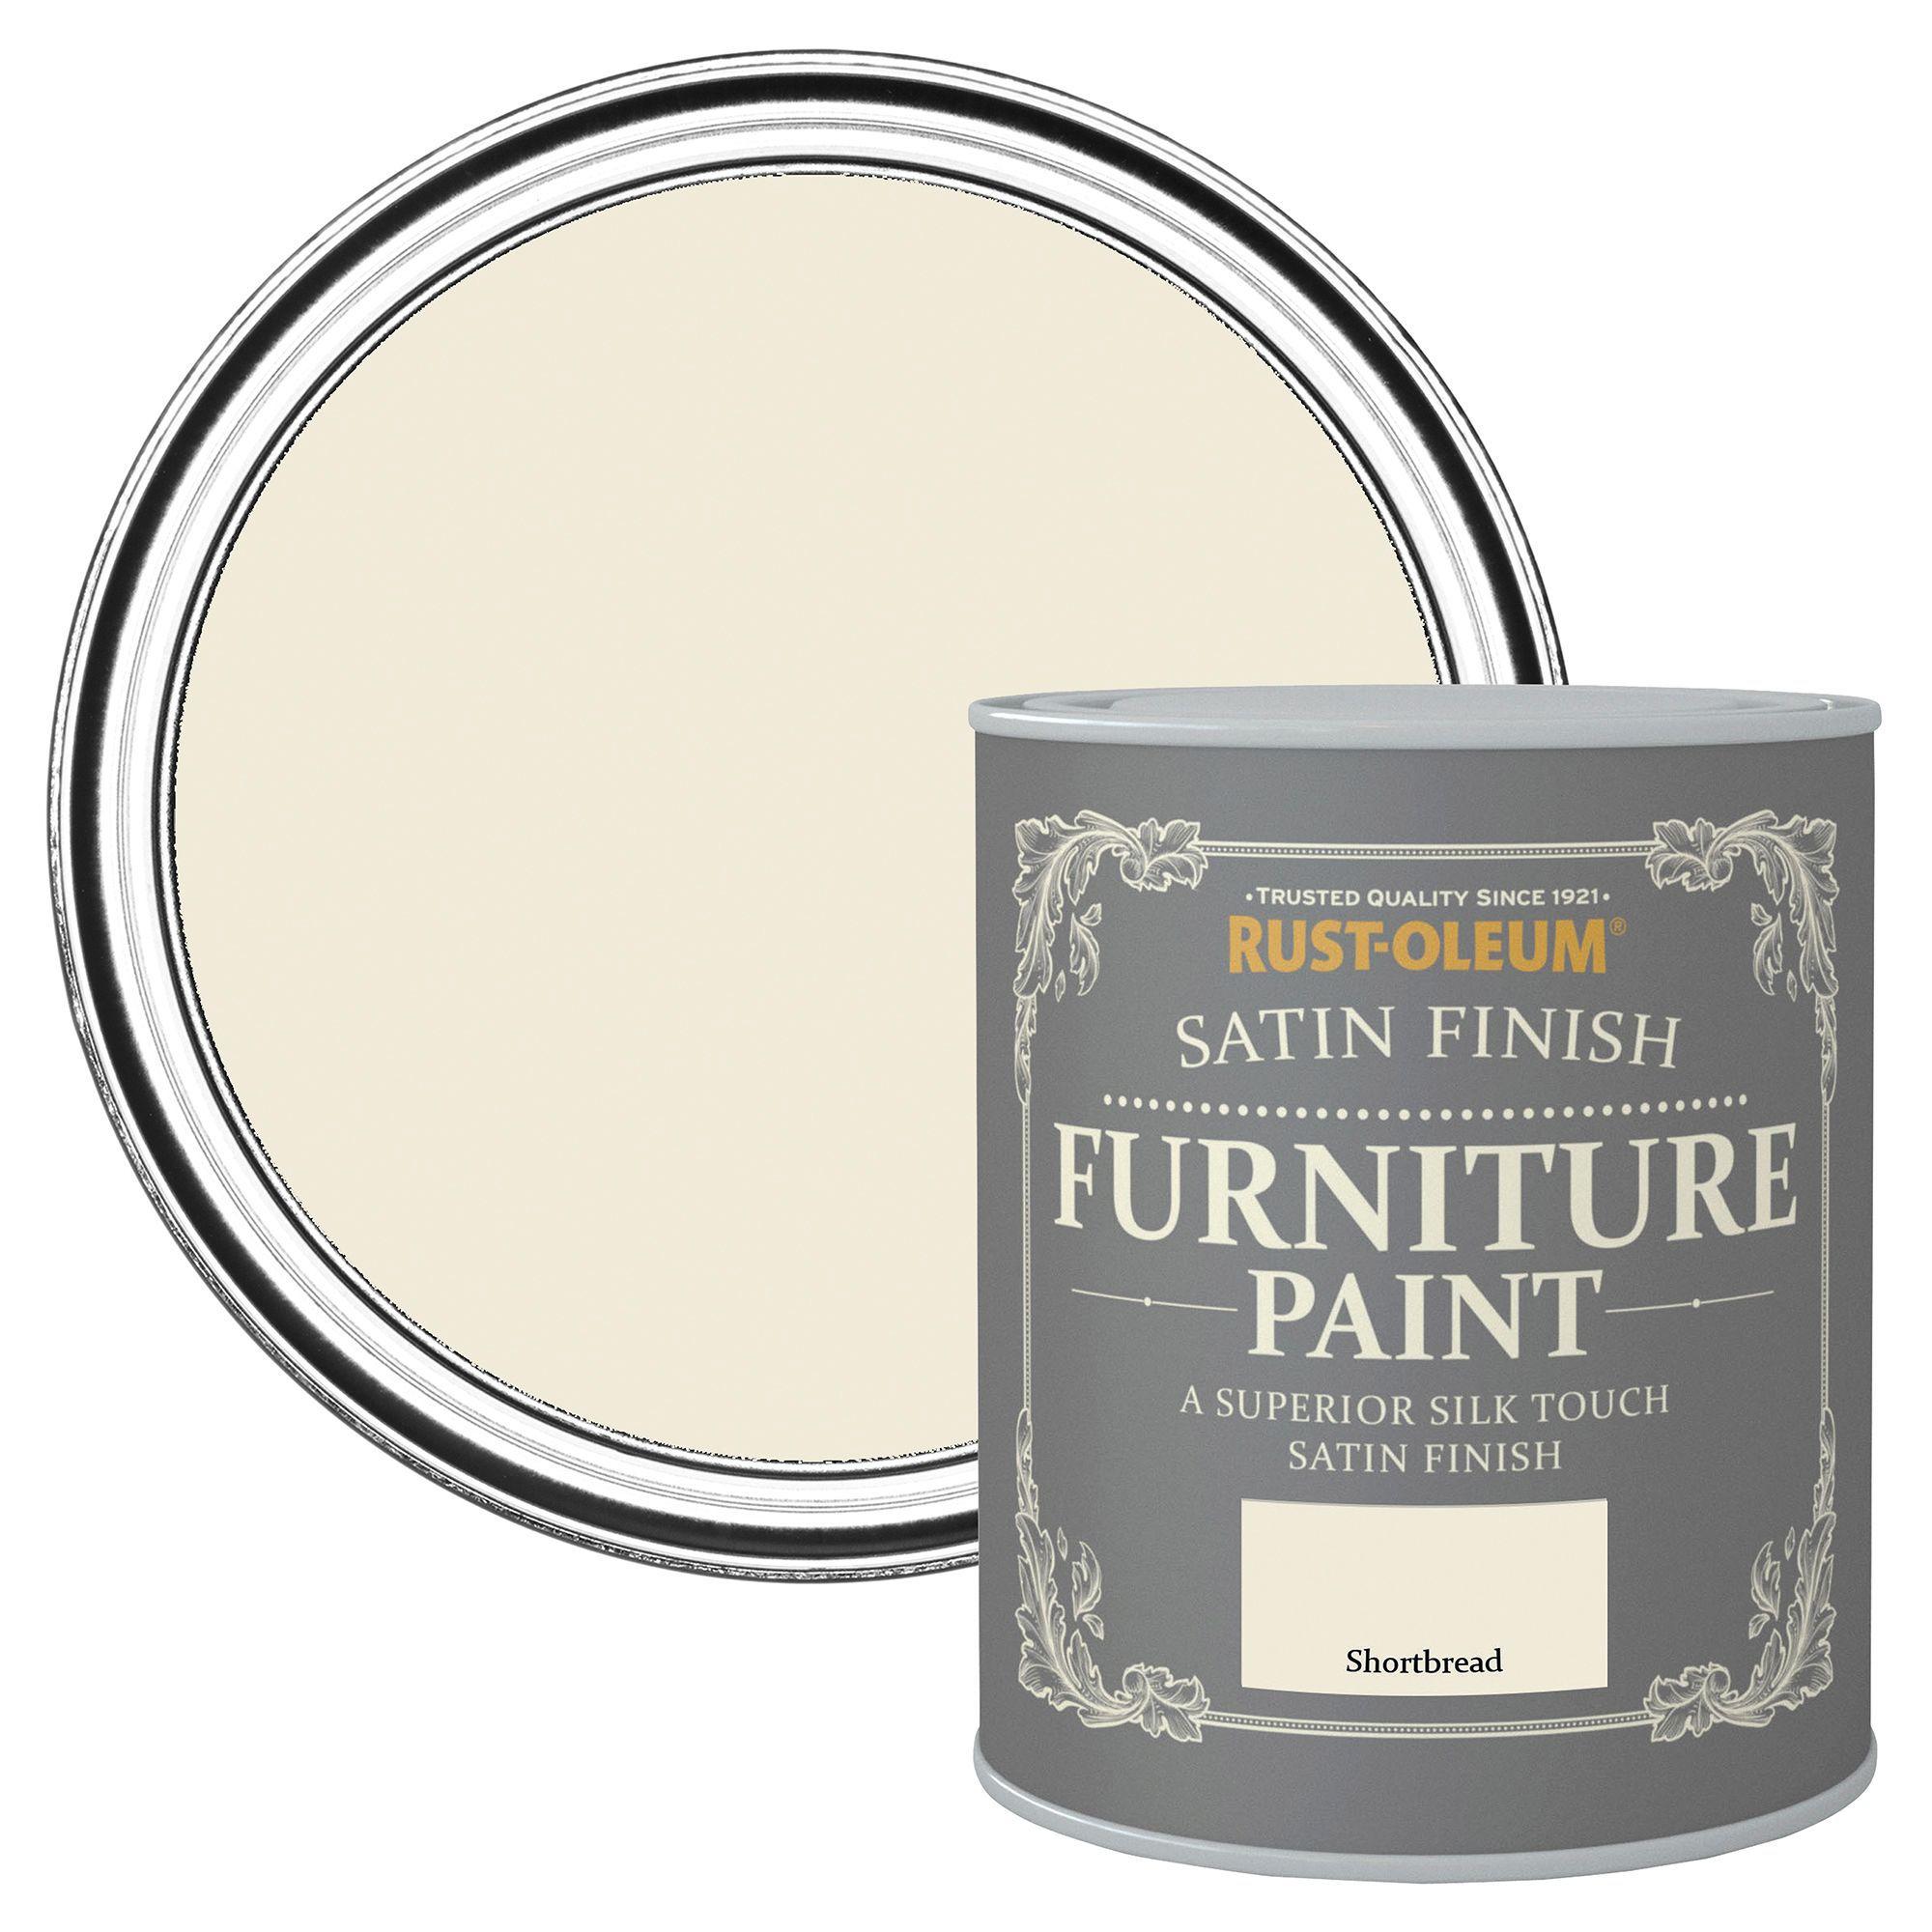 Satin Furniture Paint Shortbread